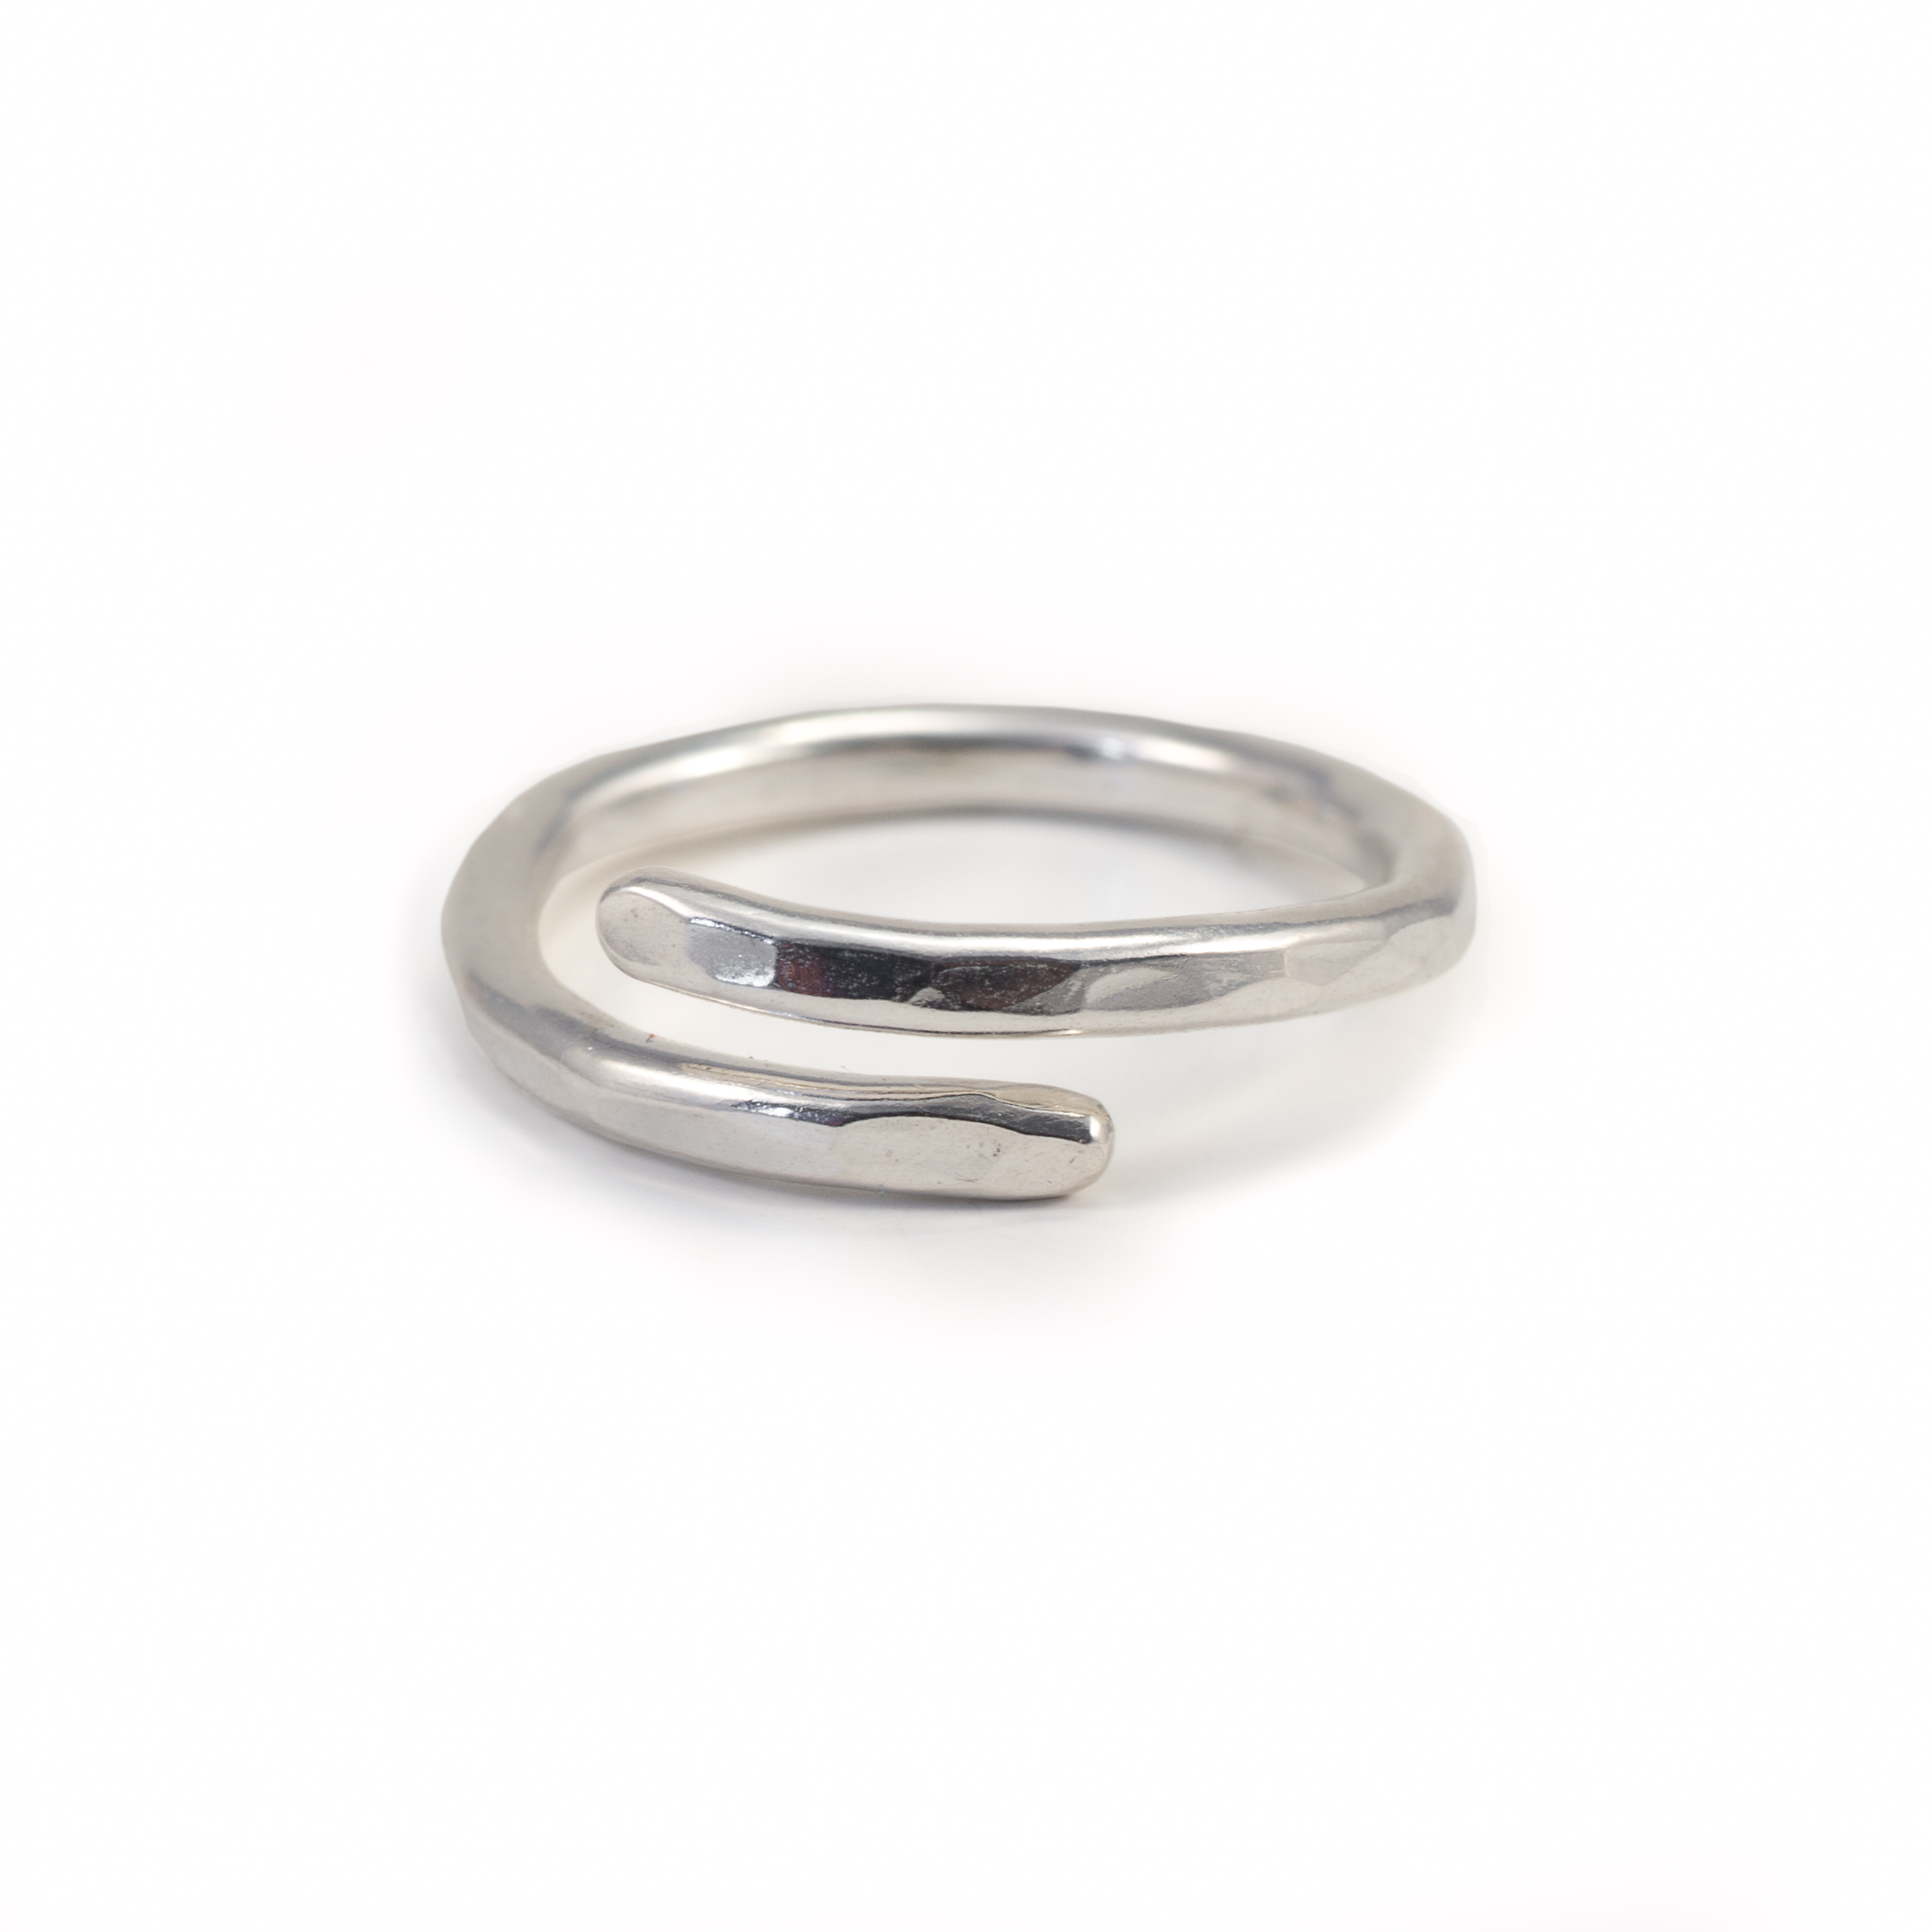 MNOP. Öppen ring 2mm. Återvunnet silver/ekosilver.